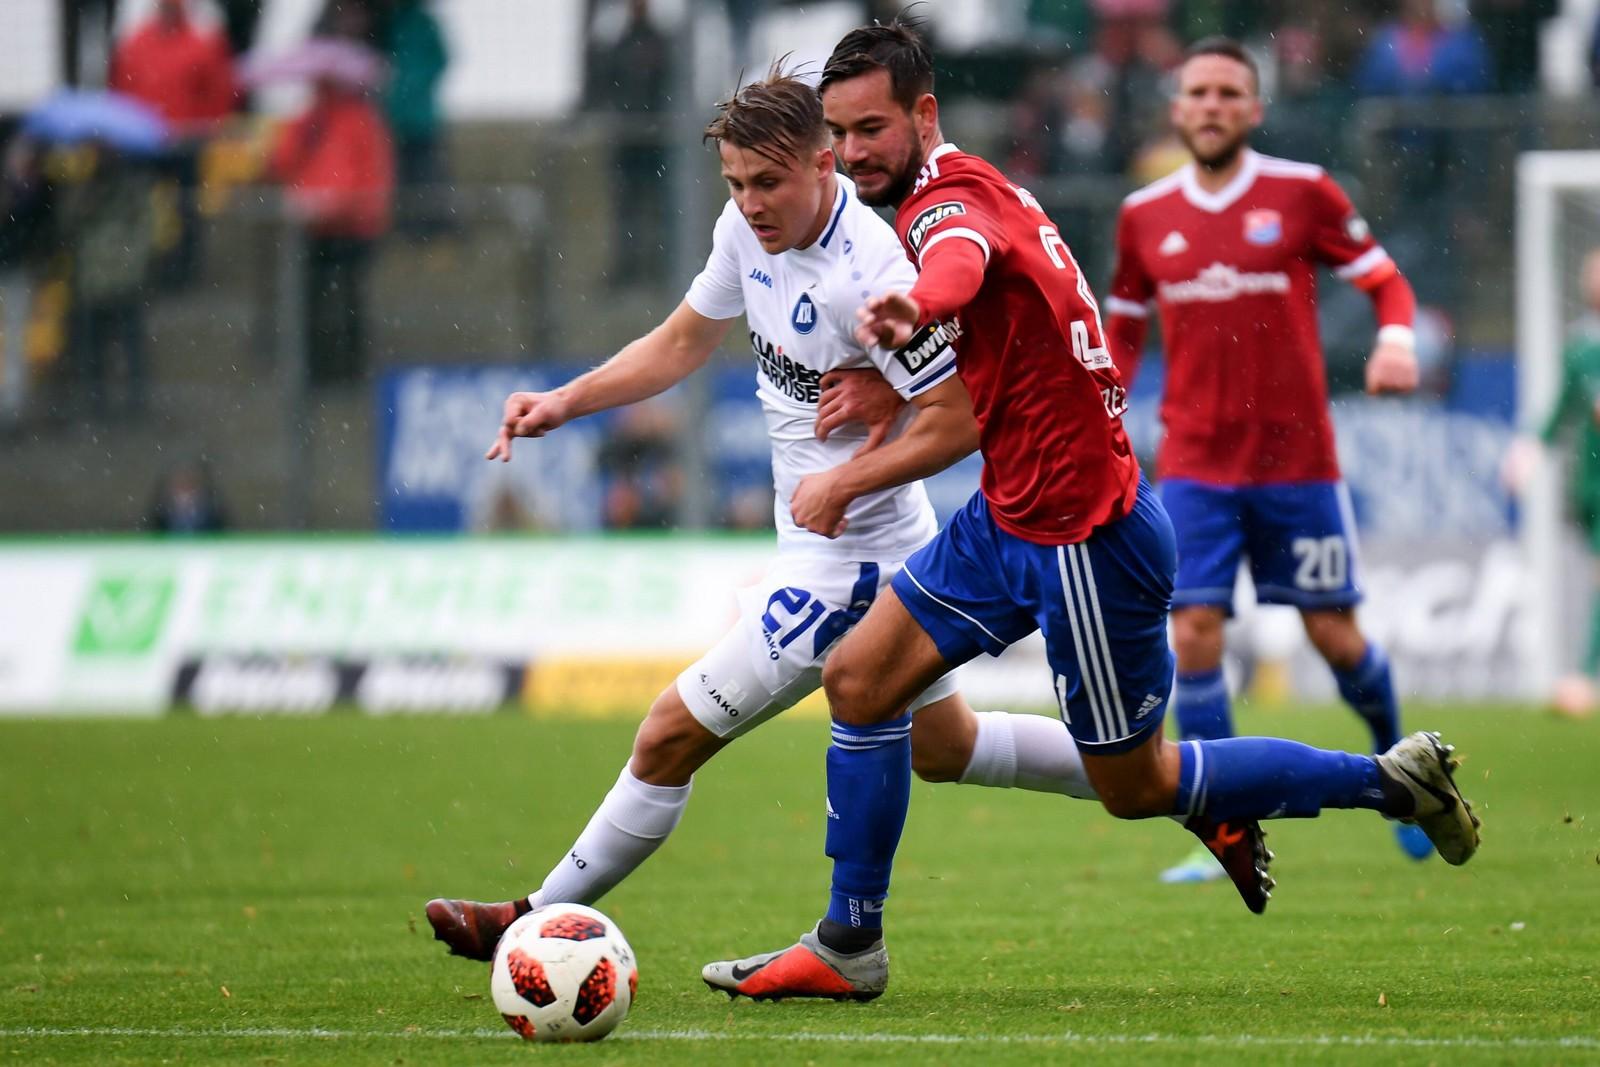 Orestis Kiomourtzoglou im Laufduell mit Karlsruhes Marco Thiede.